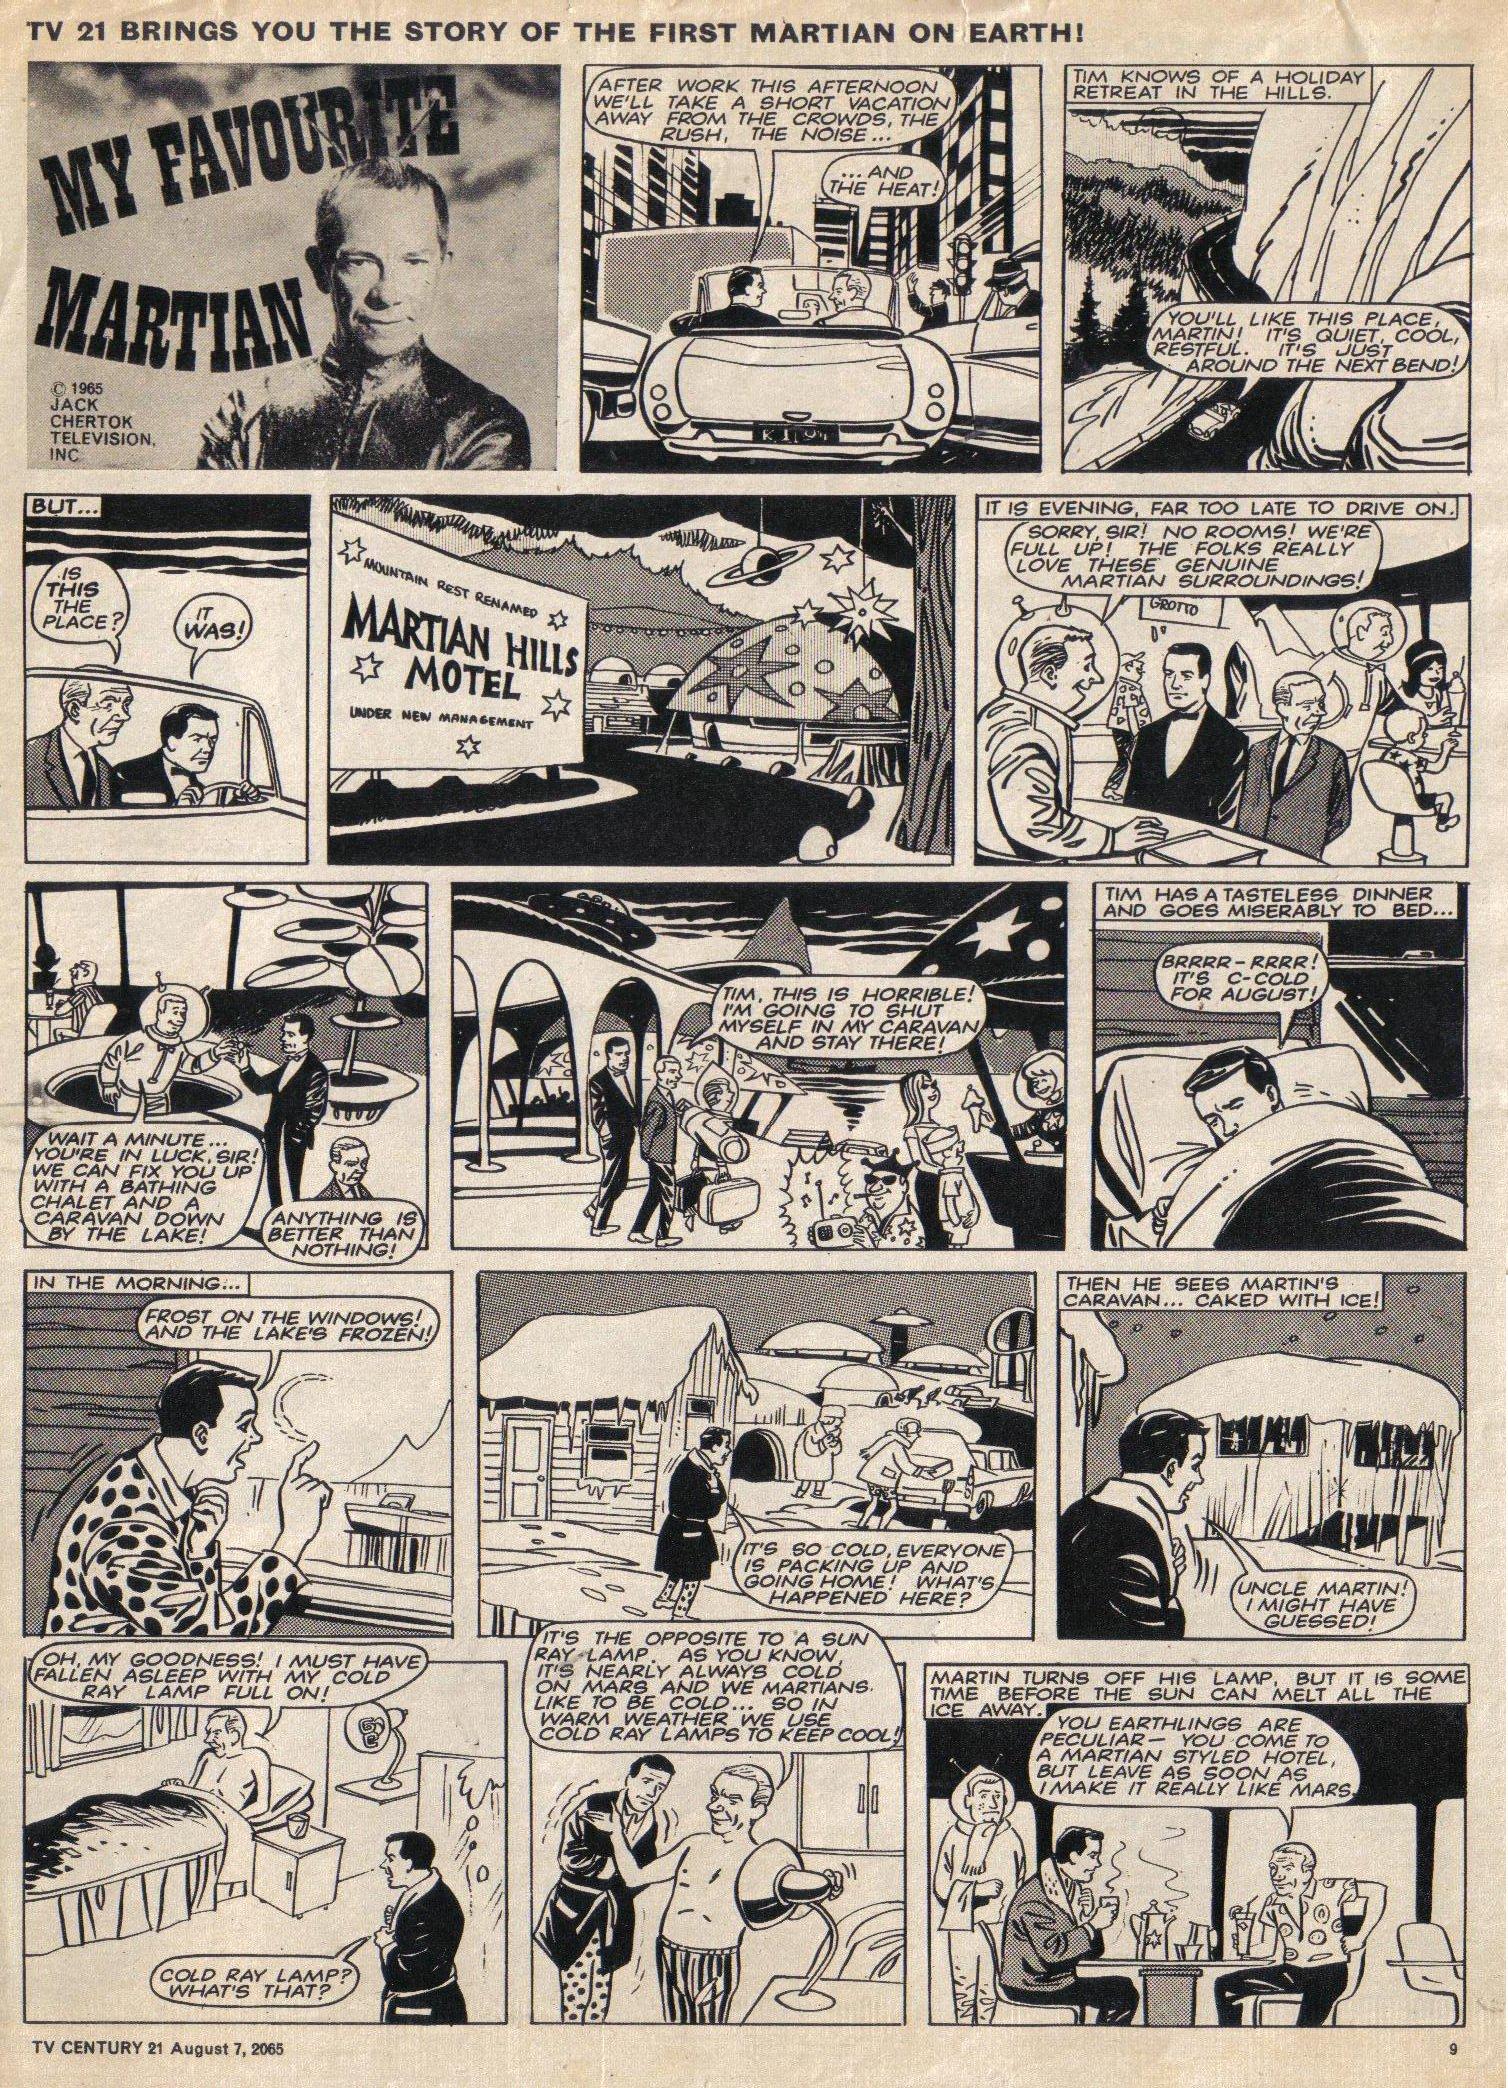 Read online TV Century 21 (TV 21) comic -  Issue #29 - 10